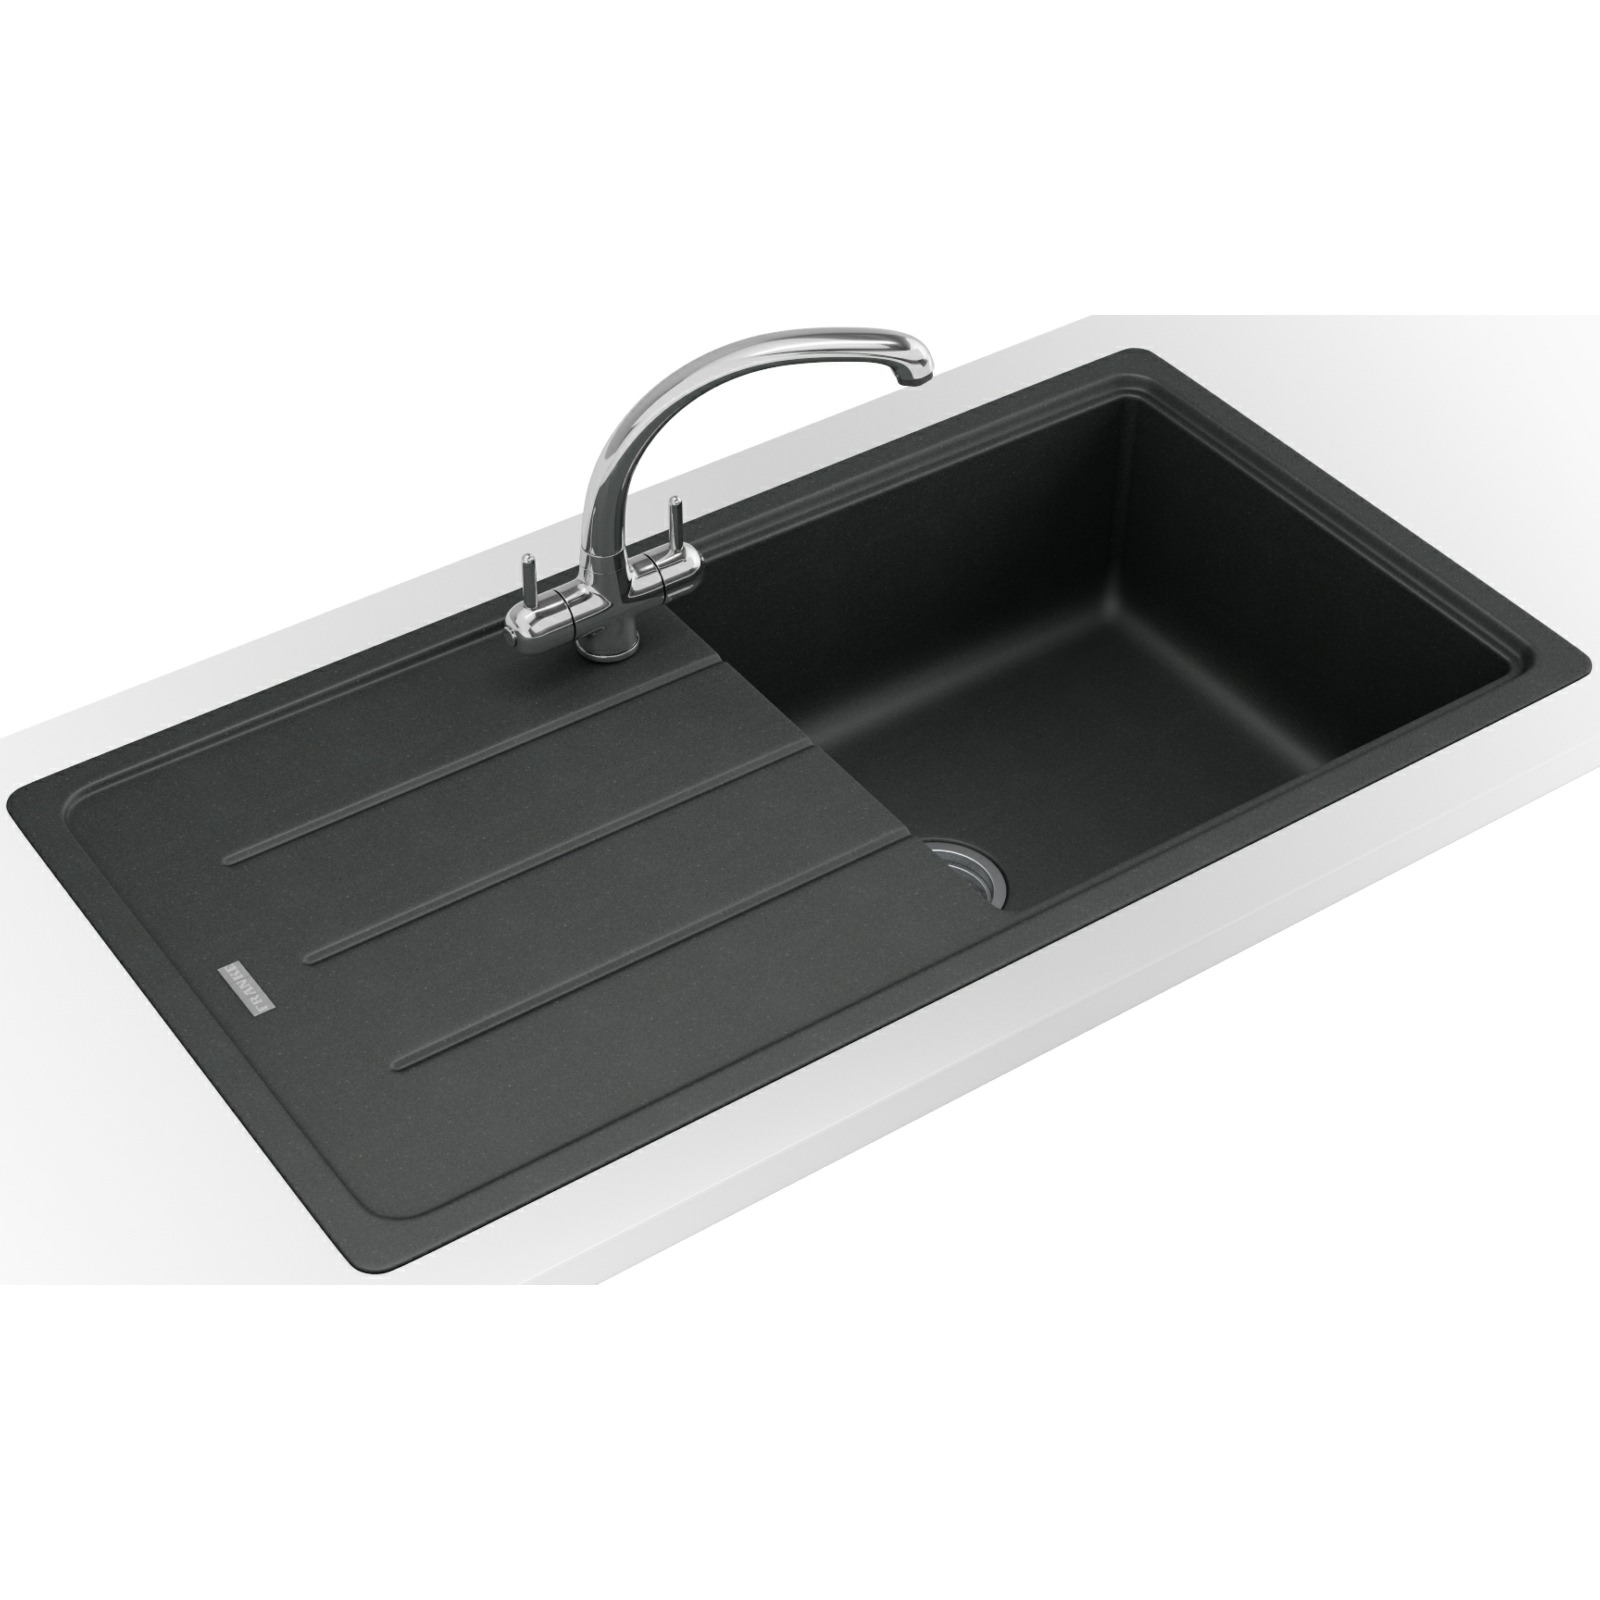 Franke Fragranite Sink Review : Franke Basis Propack BFG 611-970 Fragranite Onyx Sink And Tap 114 ...